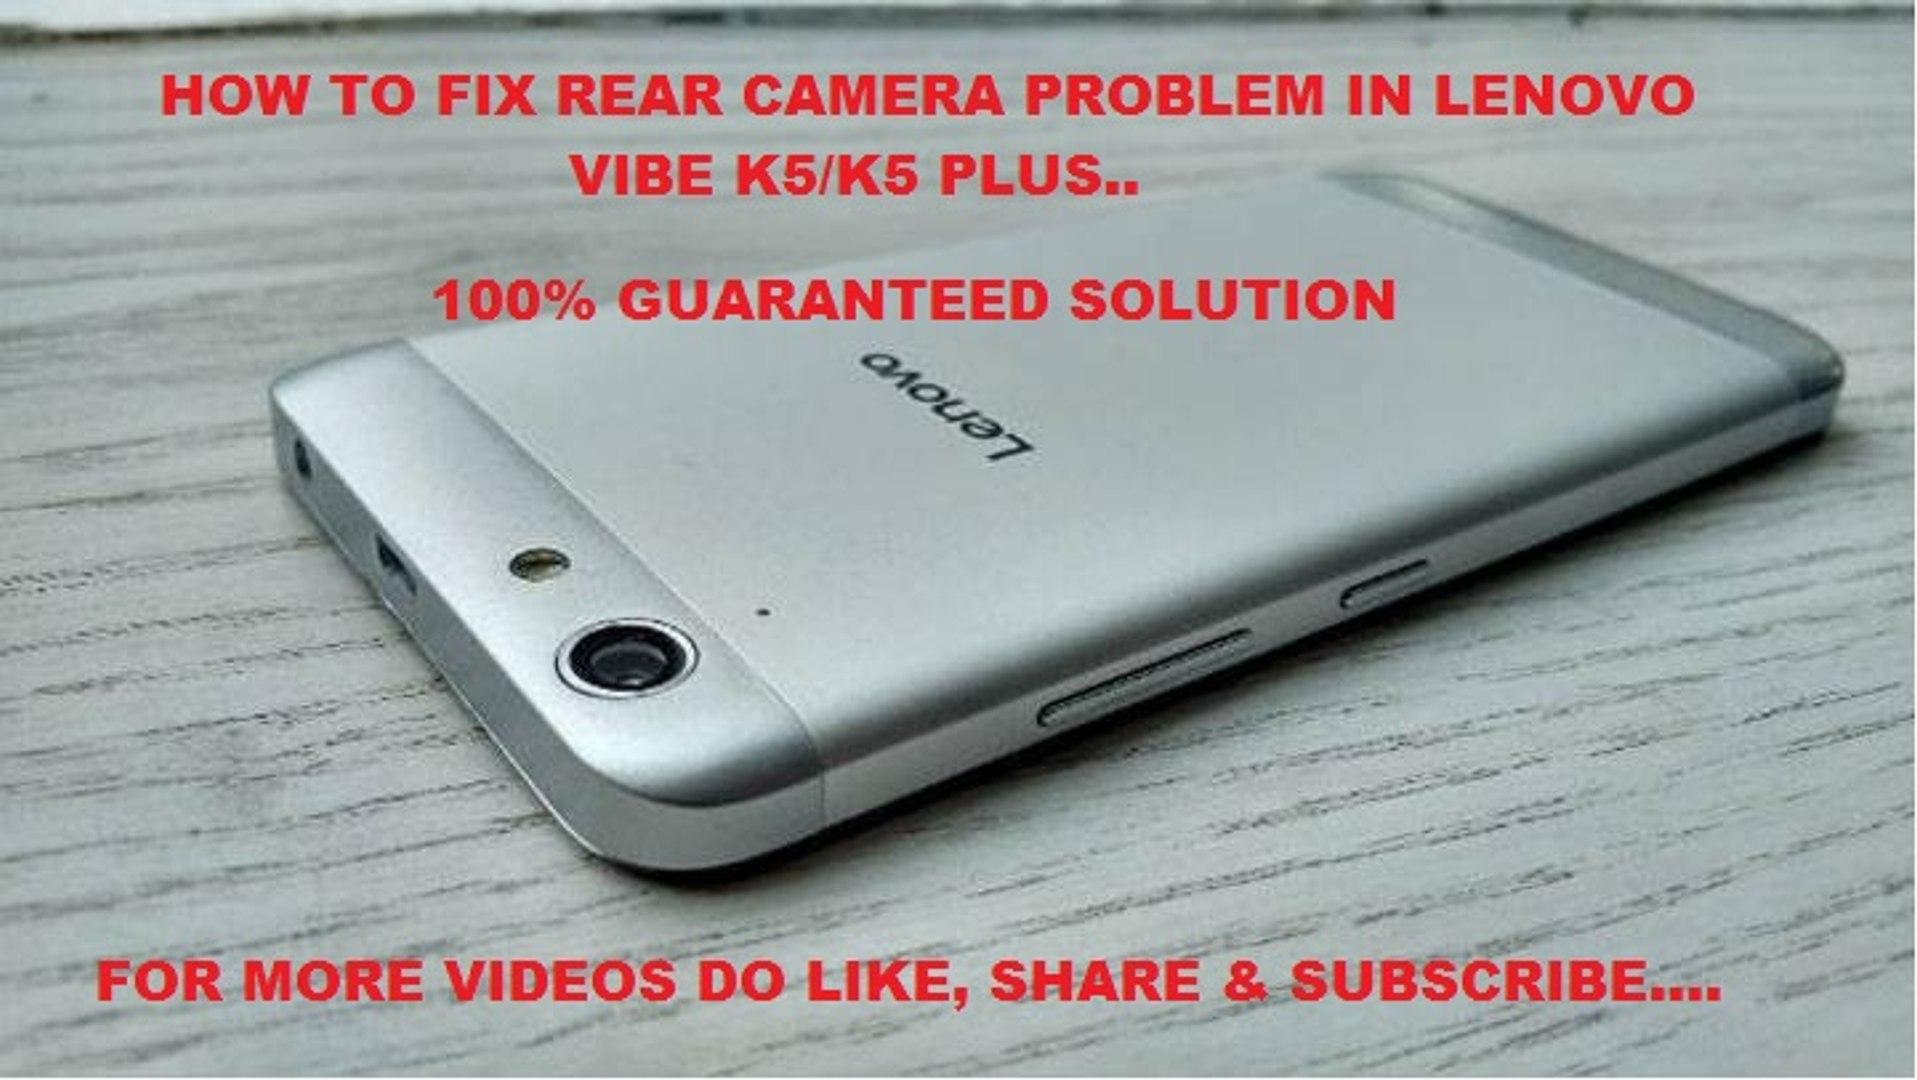 HOW TO FIX REAR CAMERA PROBLEM IN LENOVO VIBE K5/K5 PLUS